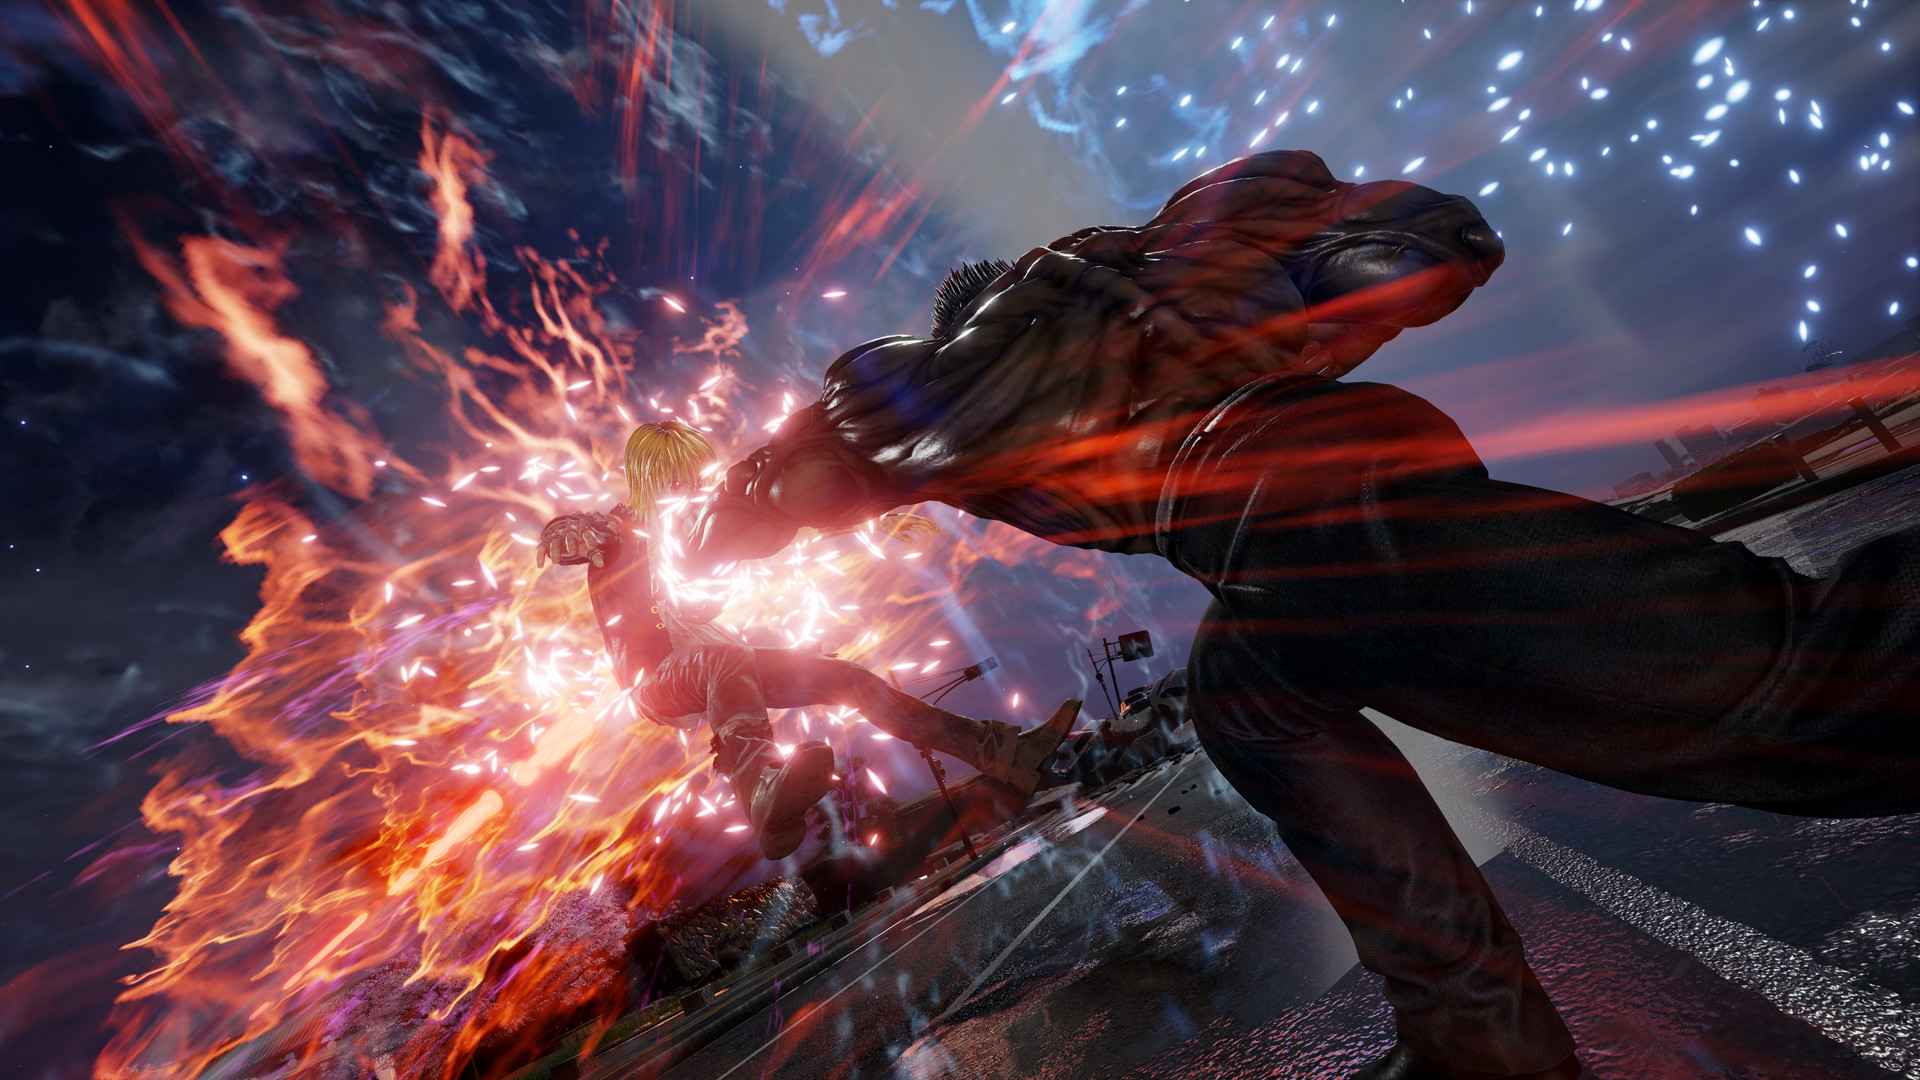 Скриншот Jump Force - Ultimate Edition (2019) PC   RePack от xatab скачать торрент бесплатно